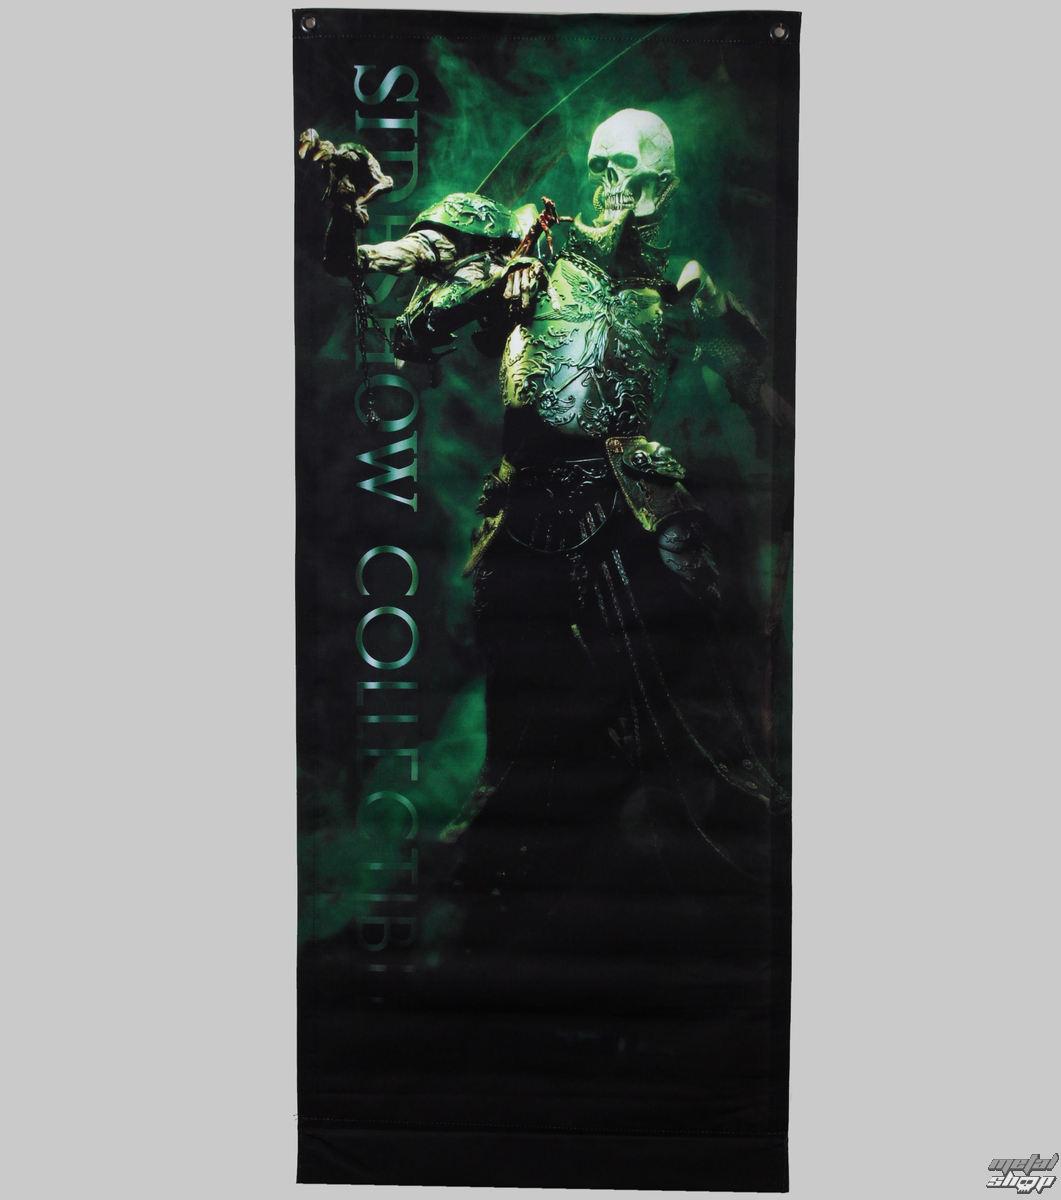 vlajka (baner) The Reaper - 64x152 - SSBAN005M